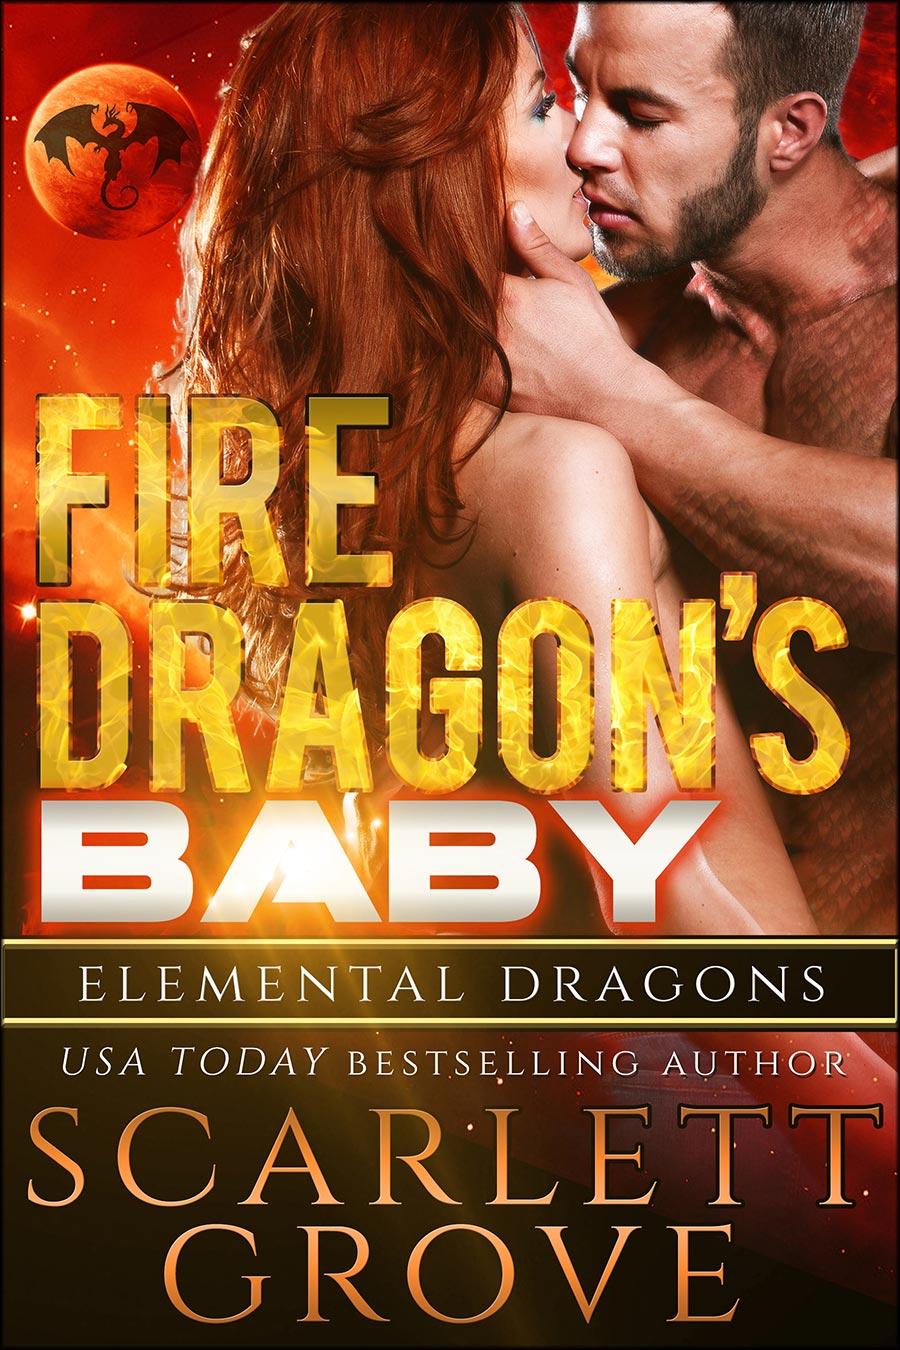 Scarlet-Grove---Alien-Dragon-Princes---Fire-Dragons-Baby.jpg